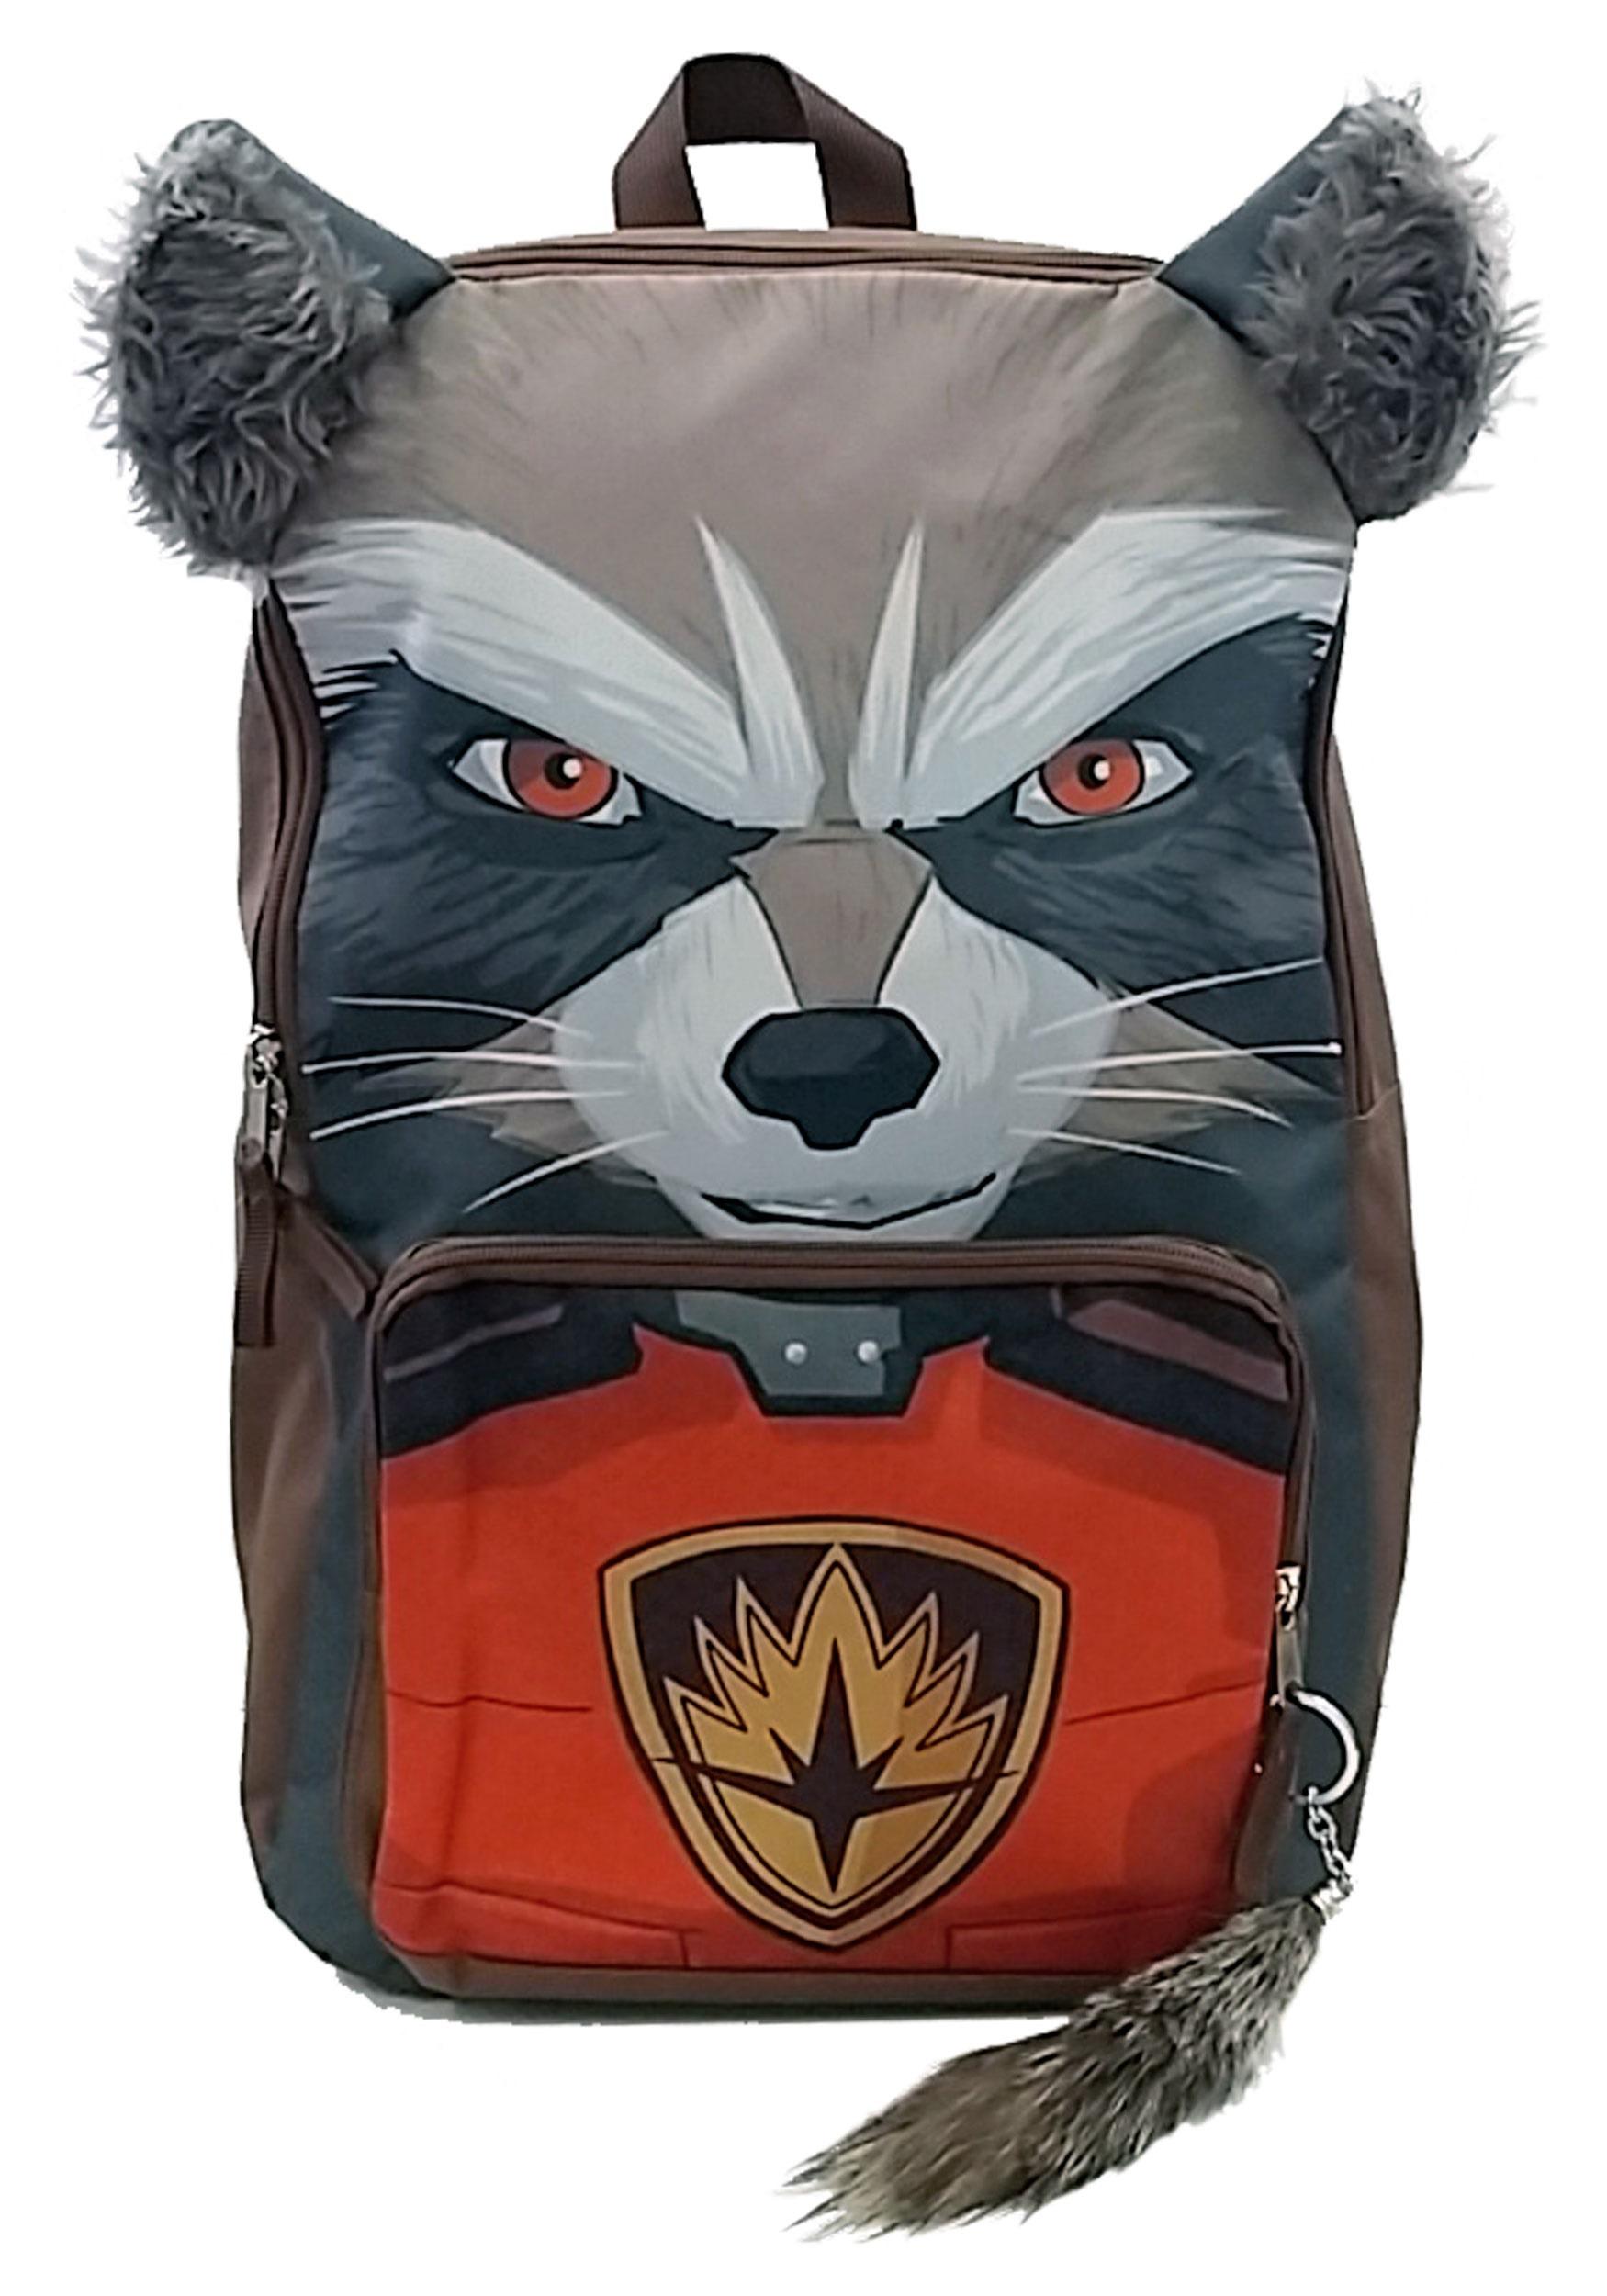 Marvel's_Guardians_of_the_Galaxy_Rocket_Raccoon_Backpack